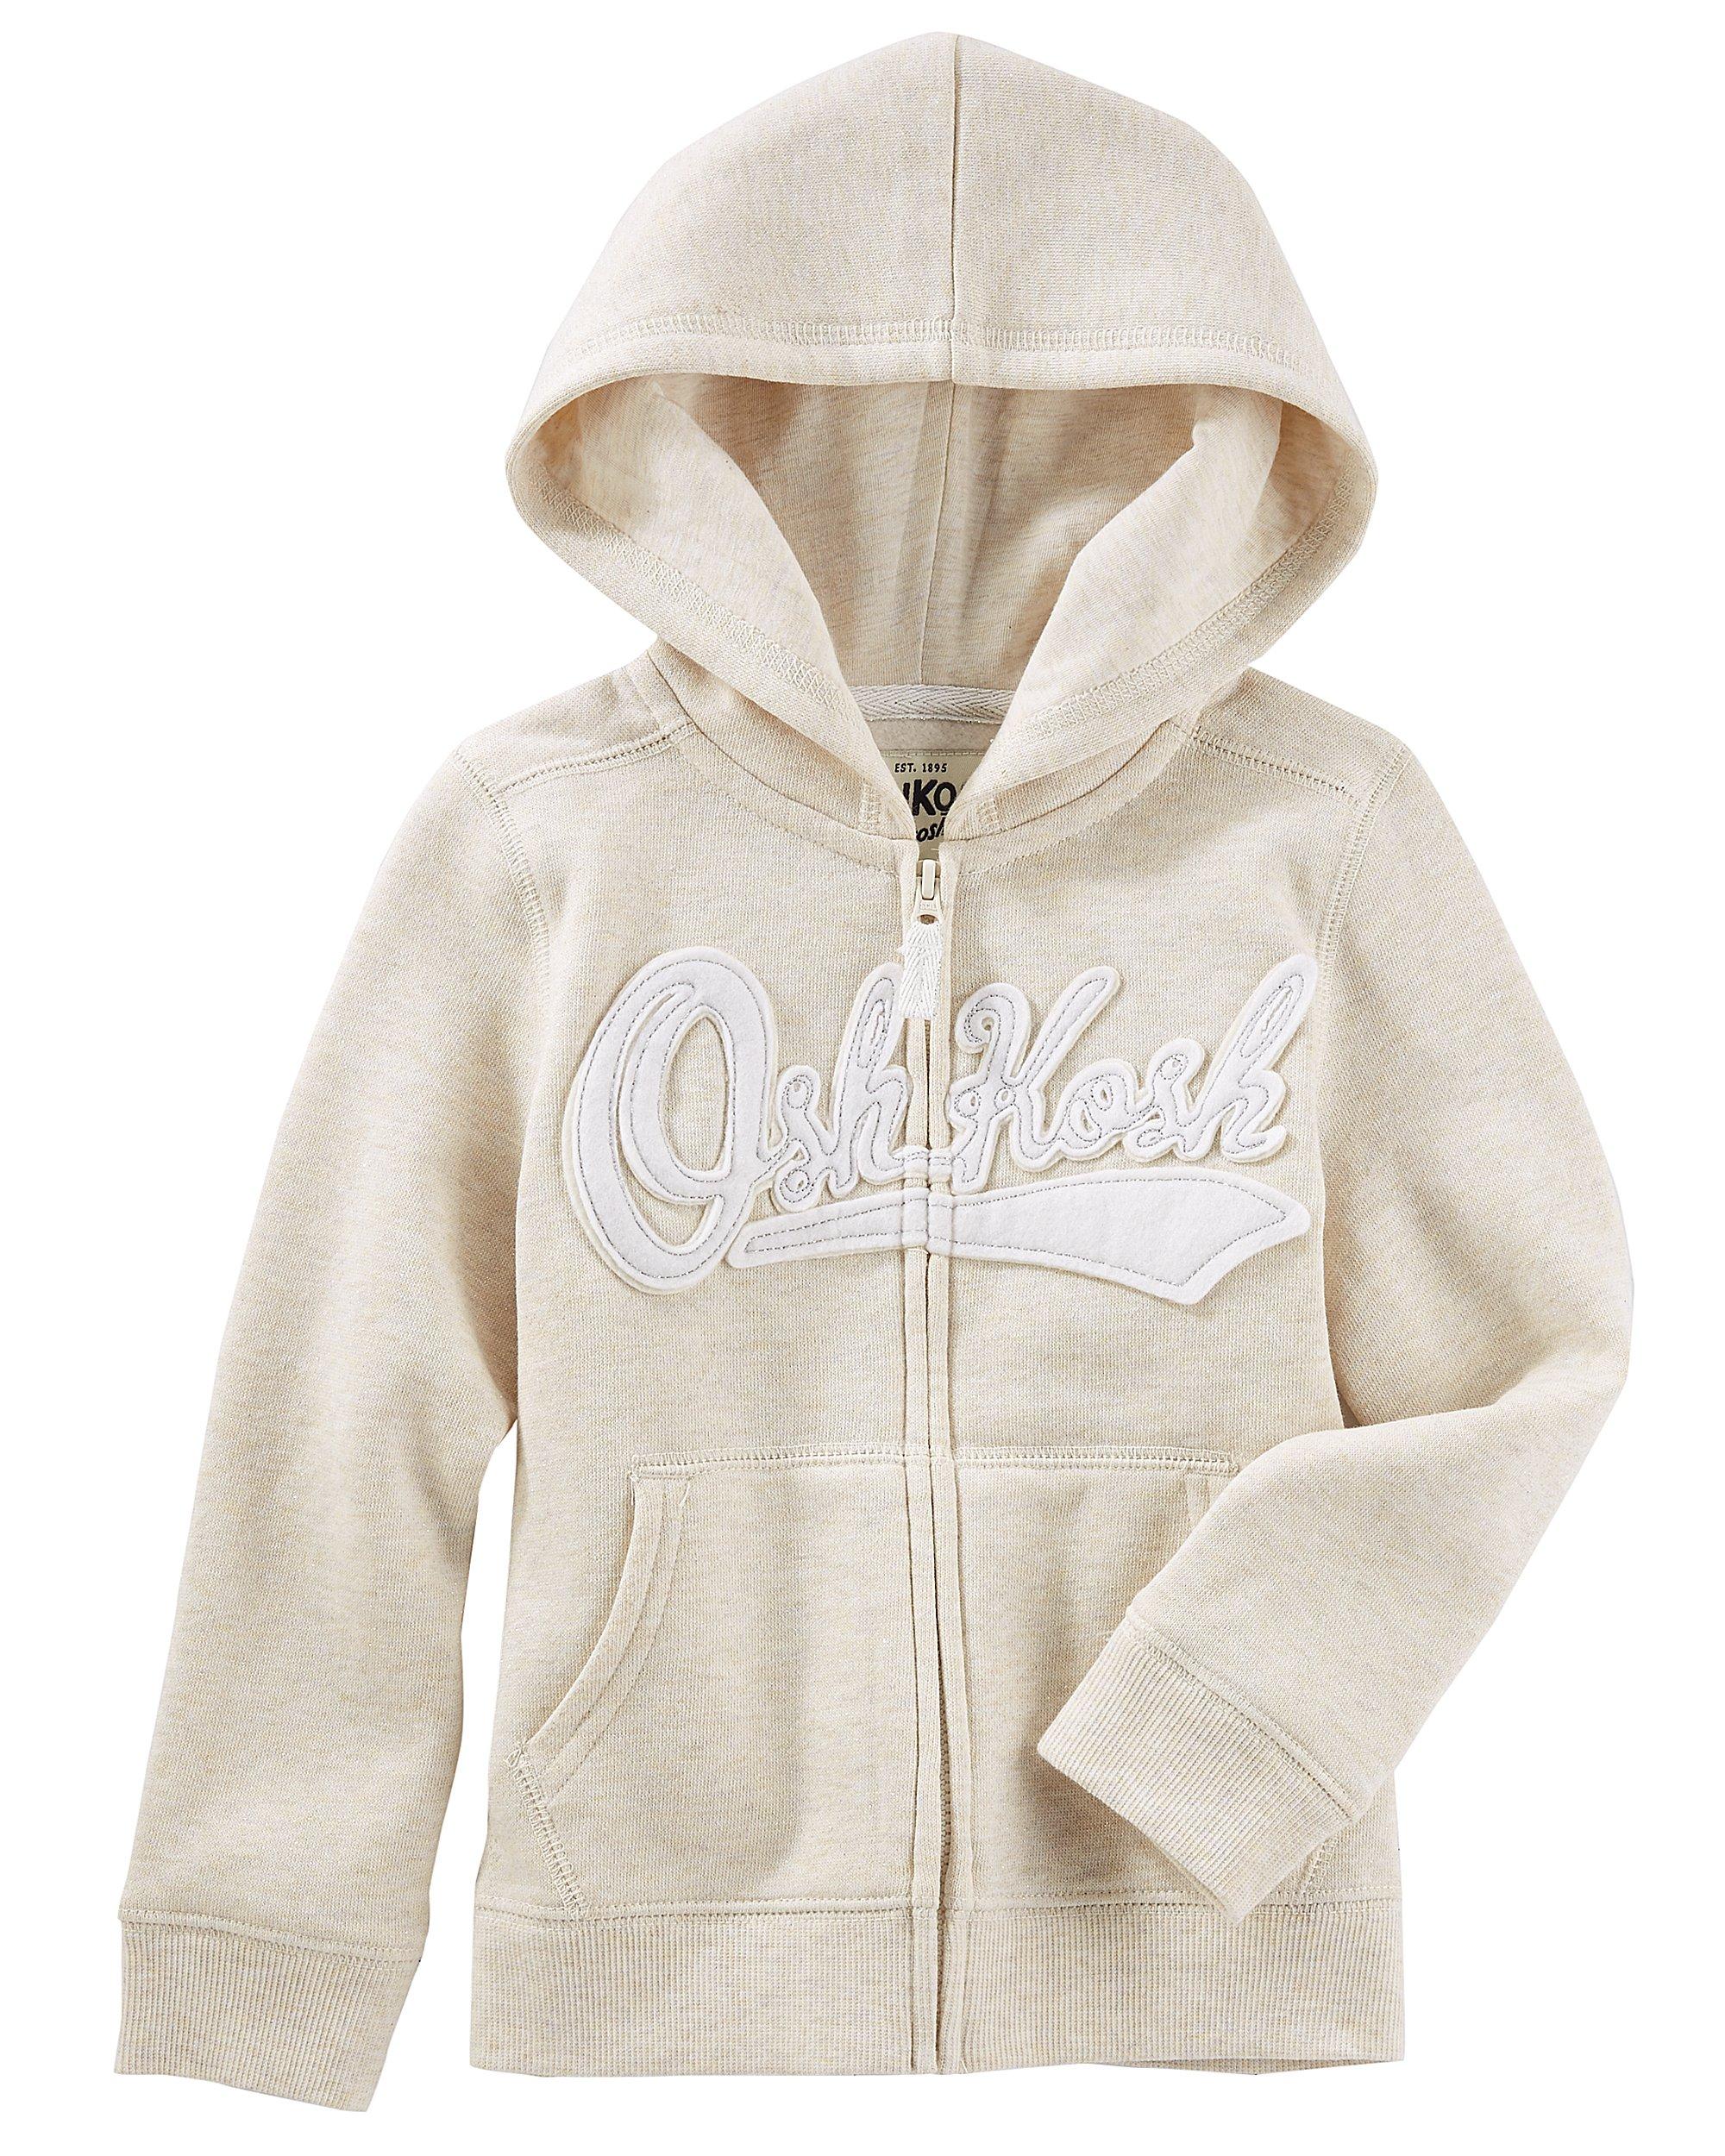 Osh Kosh Girls' Toddler Full Zip Logo Hoodie, Oatmeal Heather, 3T